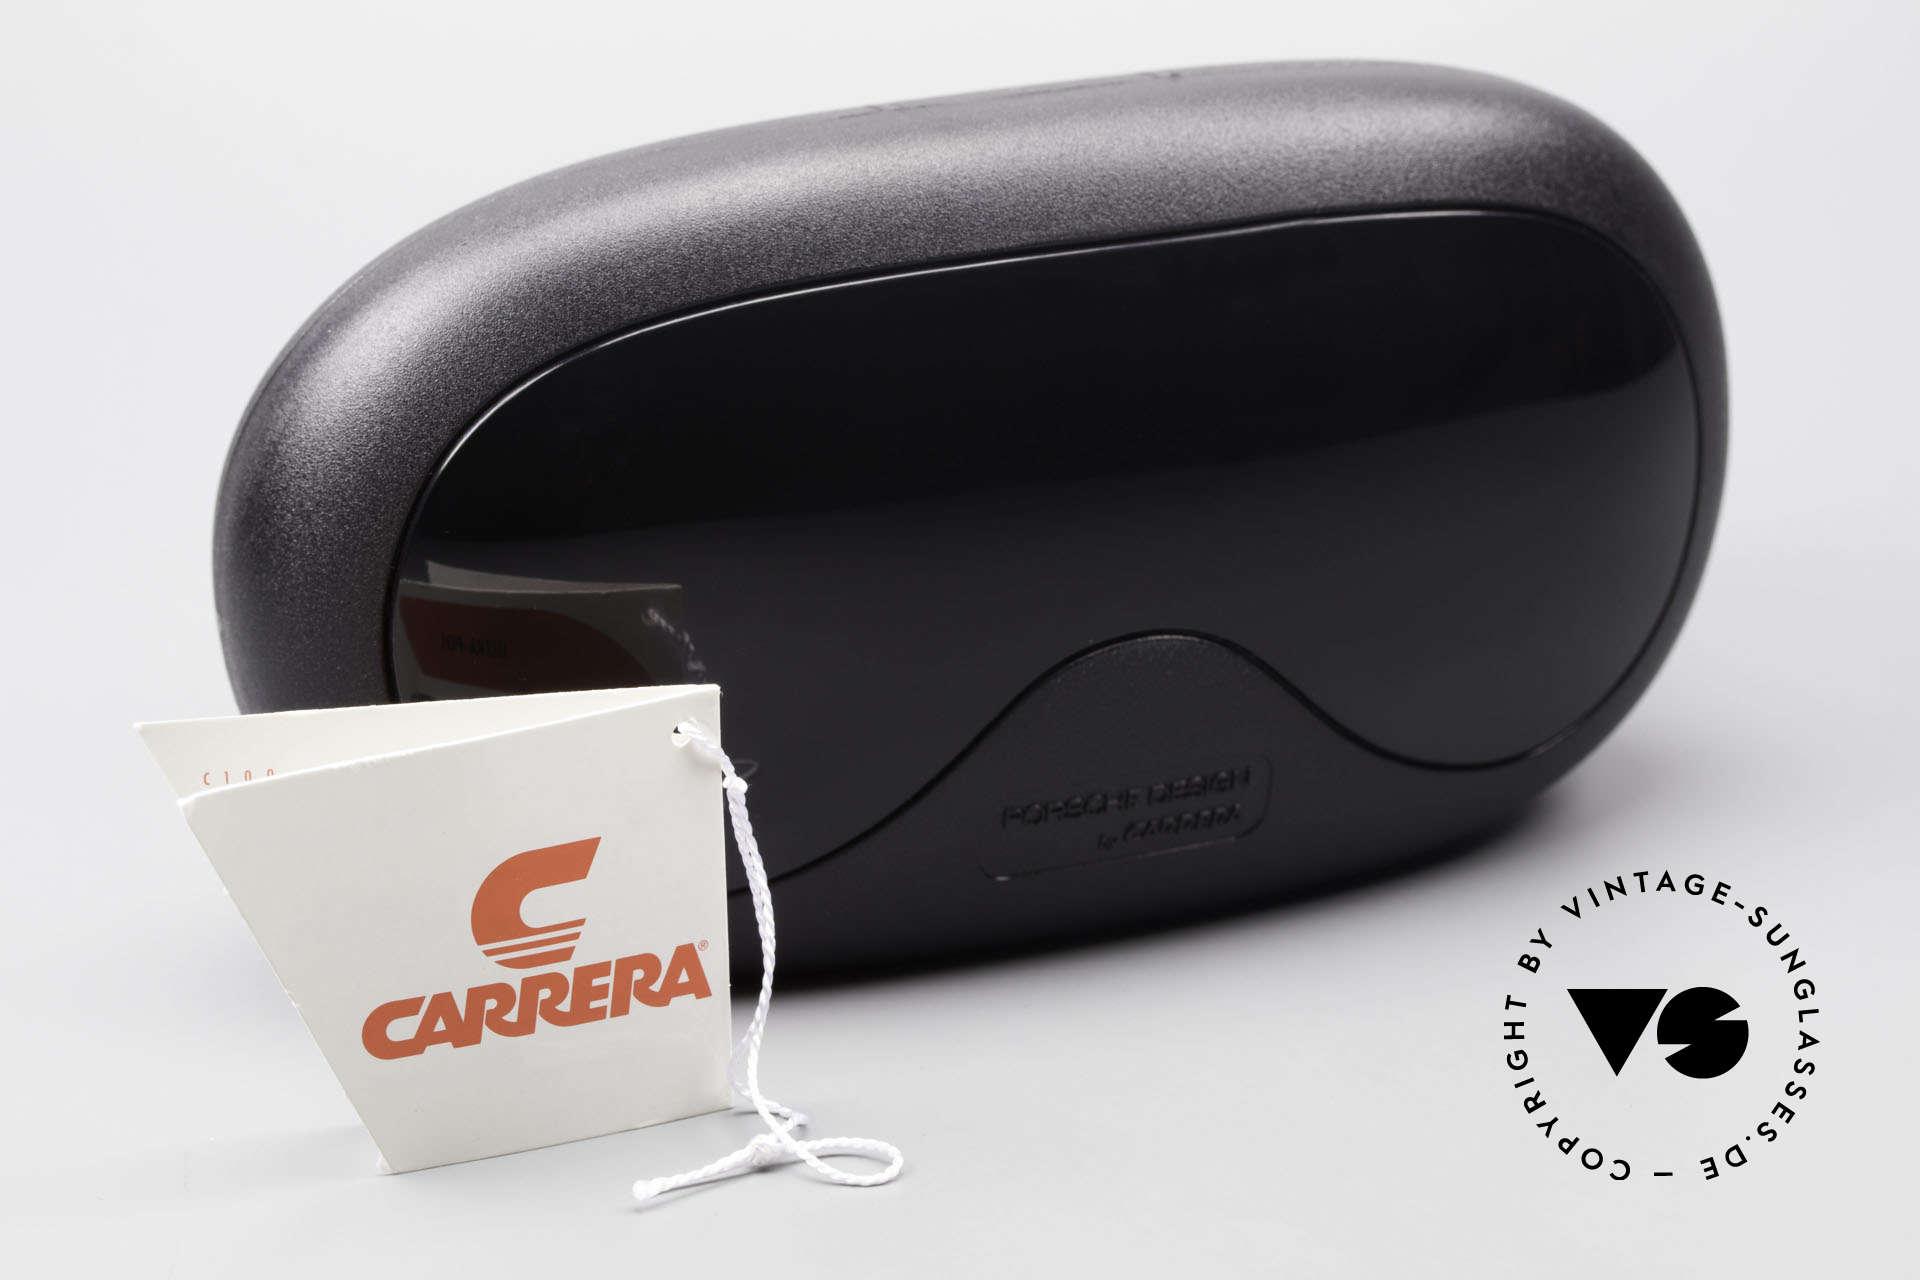 Carrera 5407 80's Sports Pilot's Sunglasses, NO retro sunglasses but an old original from 1989, Made for Men